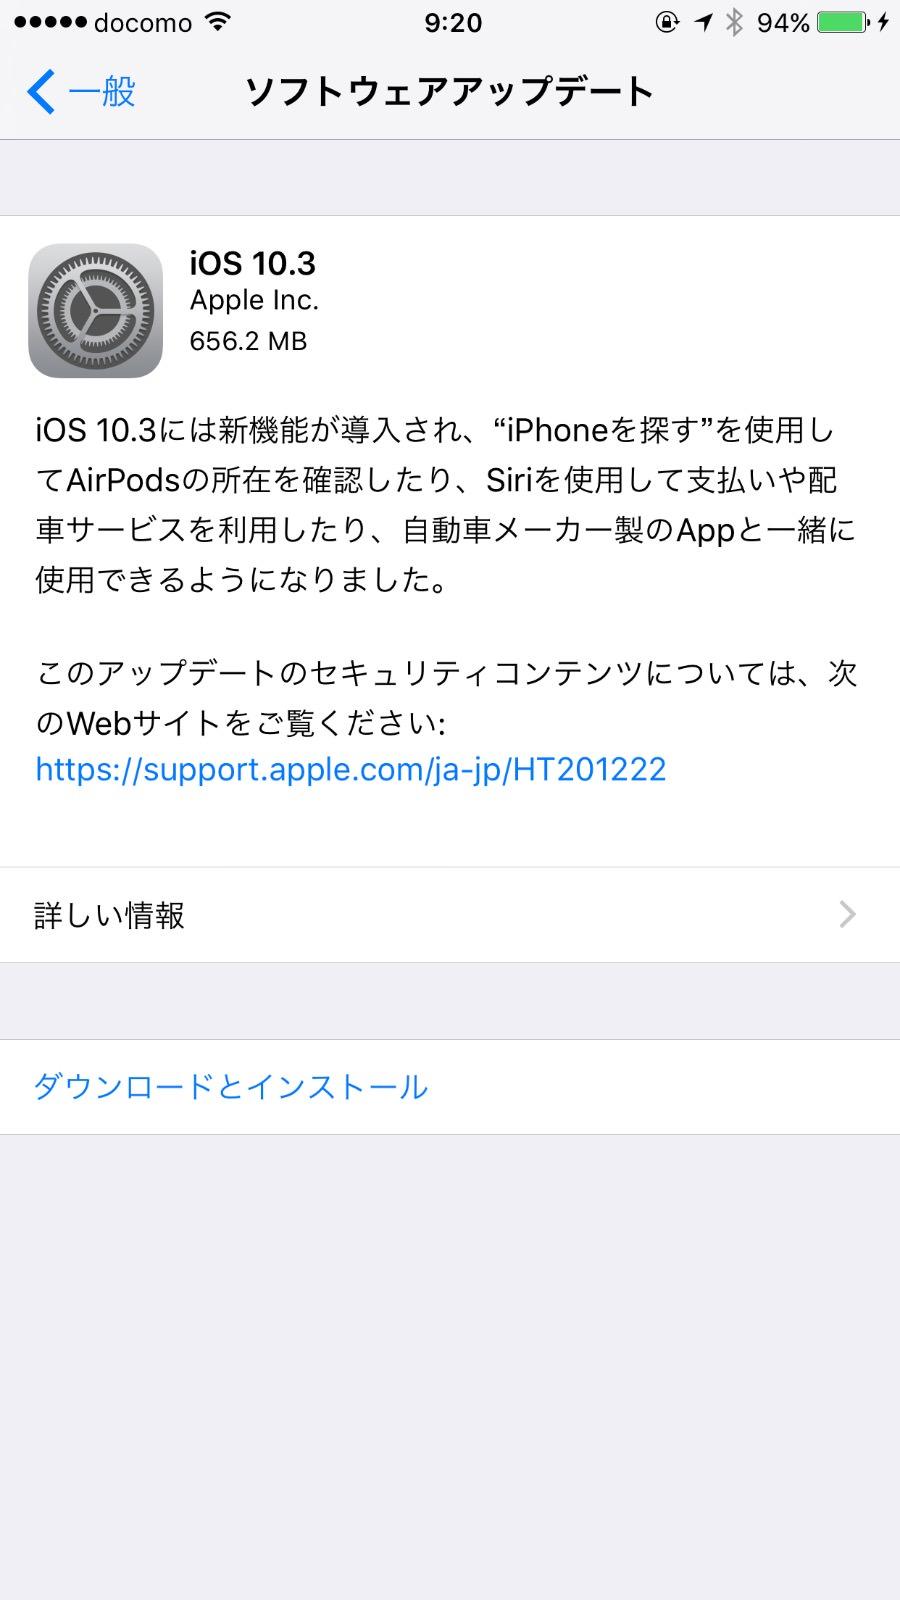 「iOS 10.3」リリース 〜AirPodsを探したり空き容量が増えたり